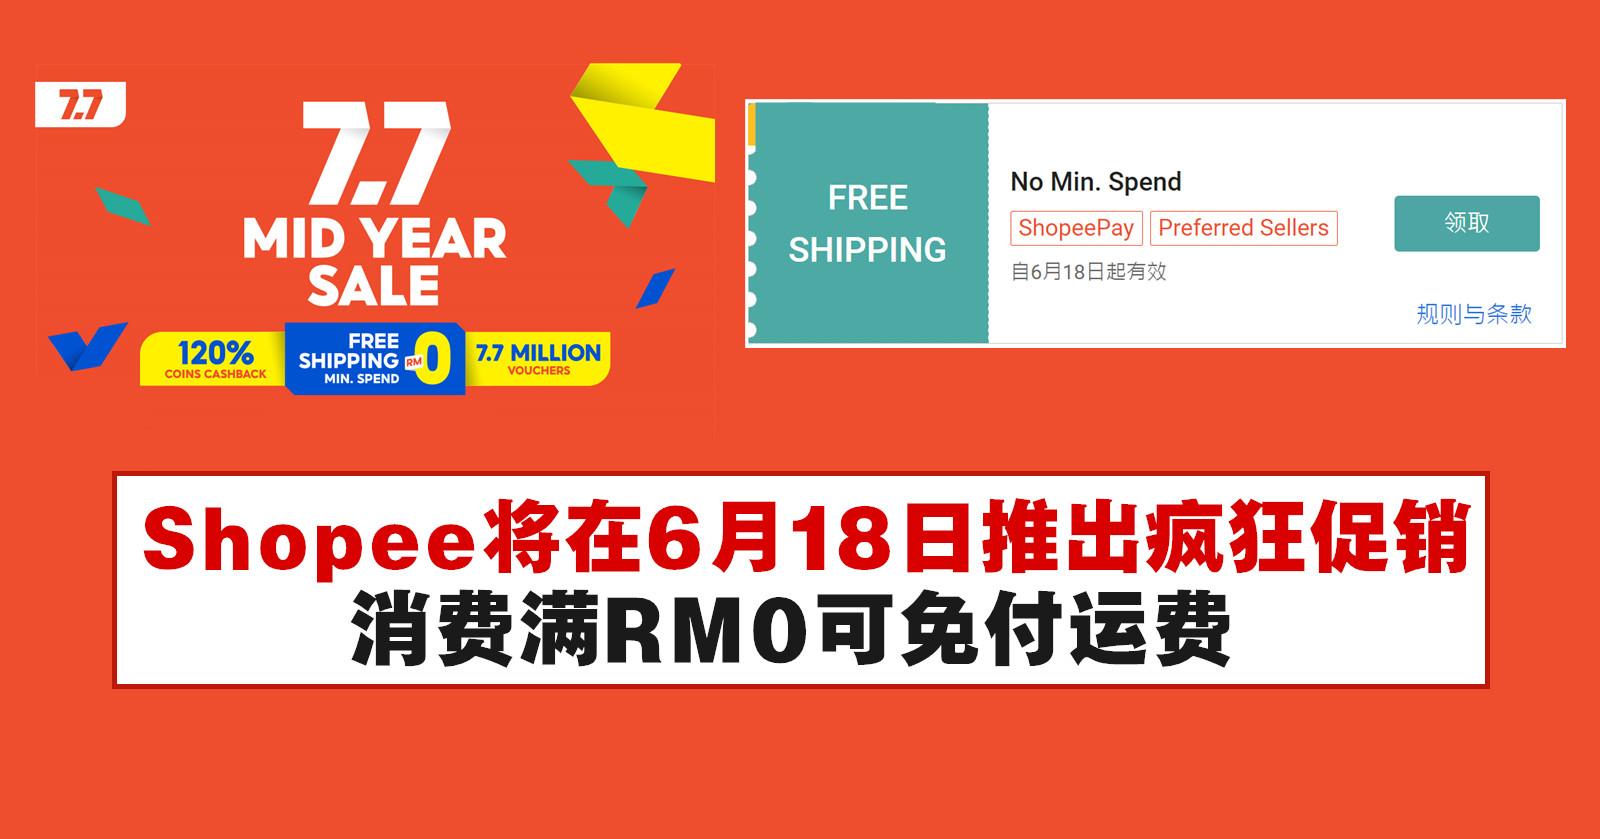 Shopee将在6月18日推出疯狂促销,消费满RM0可免付运费